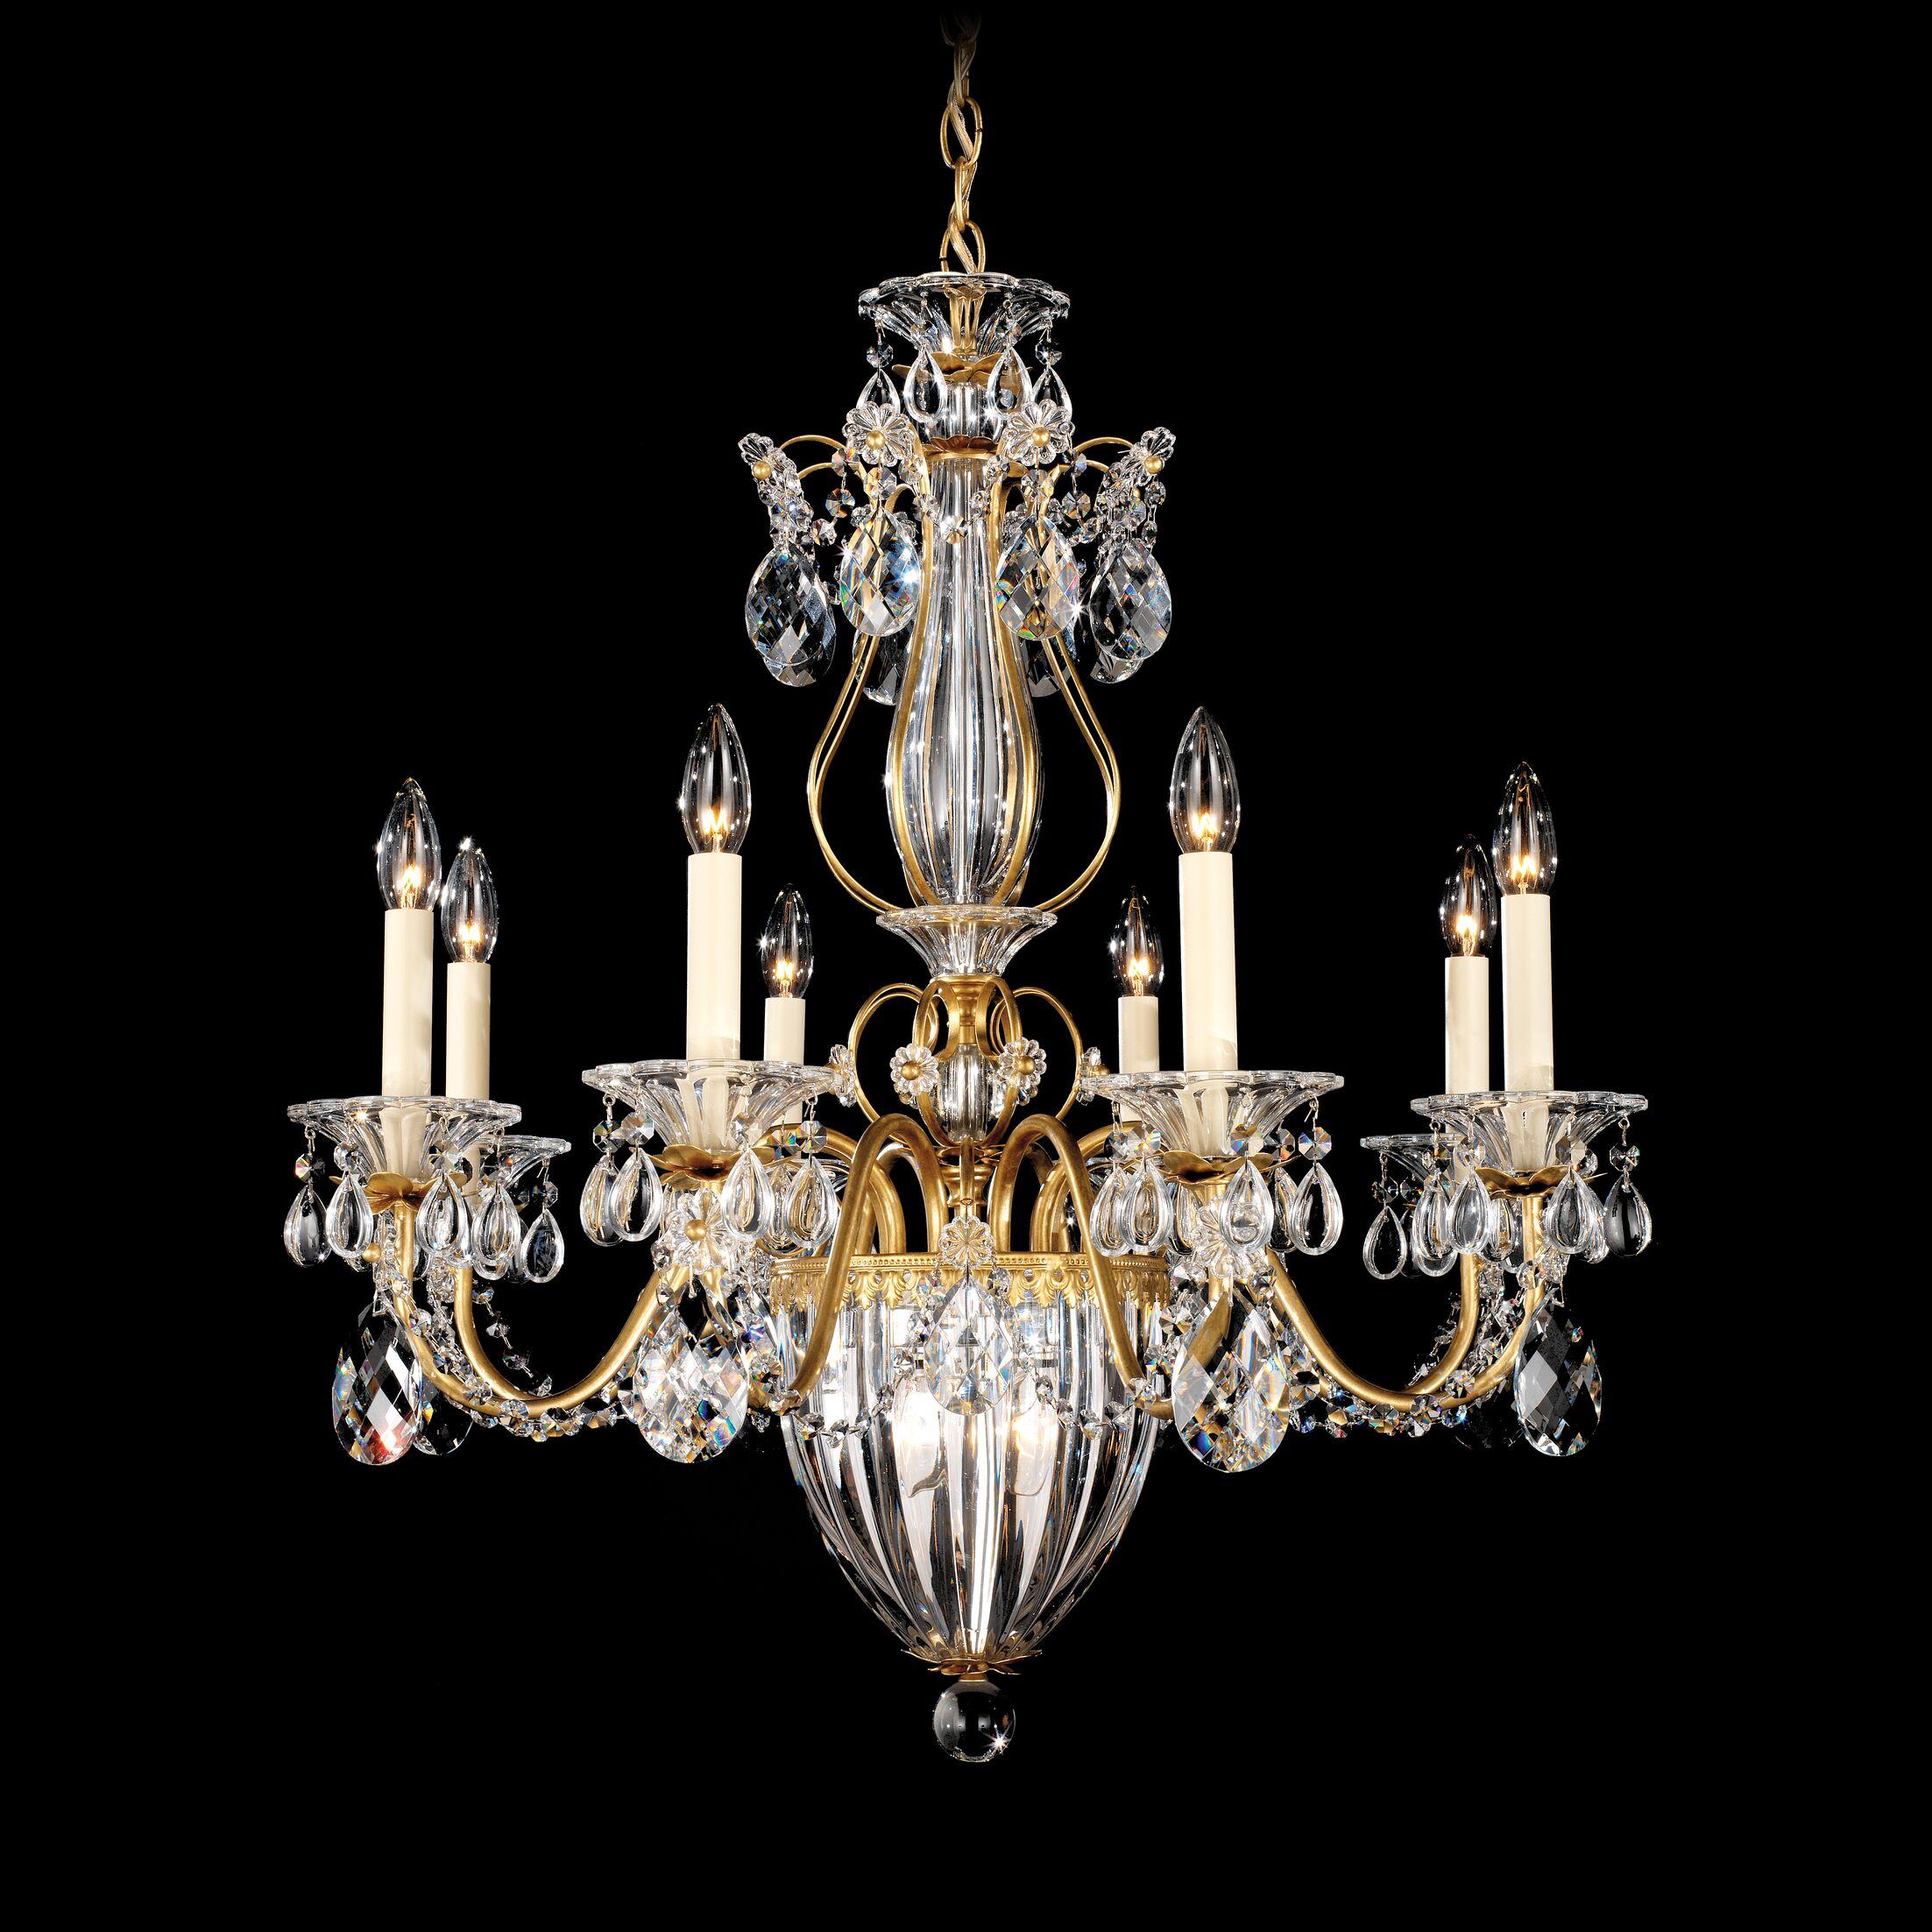 Bagatelle 11-Light Chandelier Finish: Heirloom Bronze, Crystal: Heritage Handcut Crystal Clear